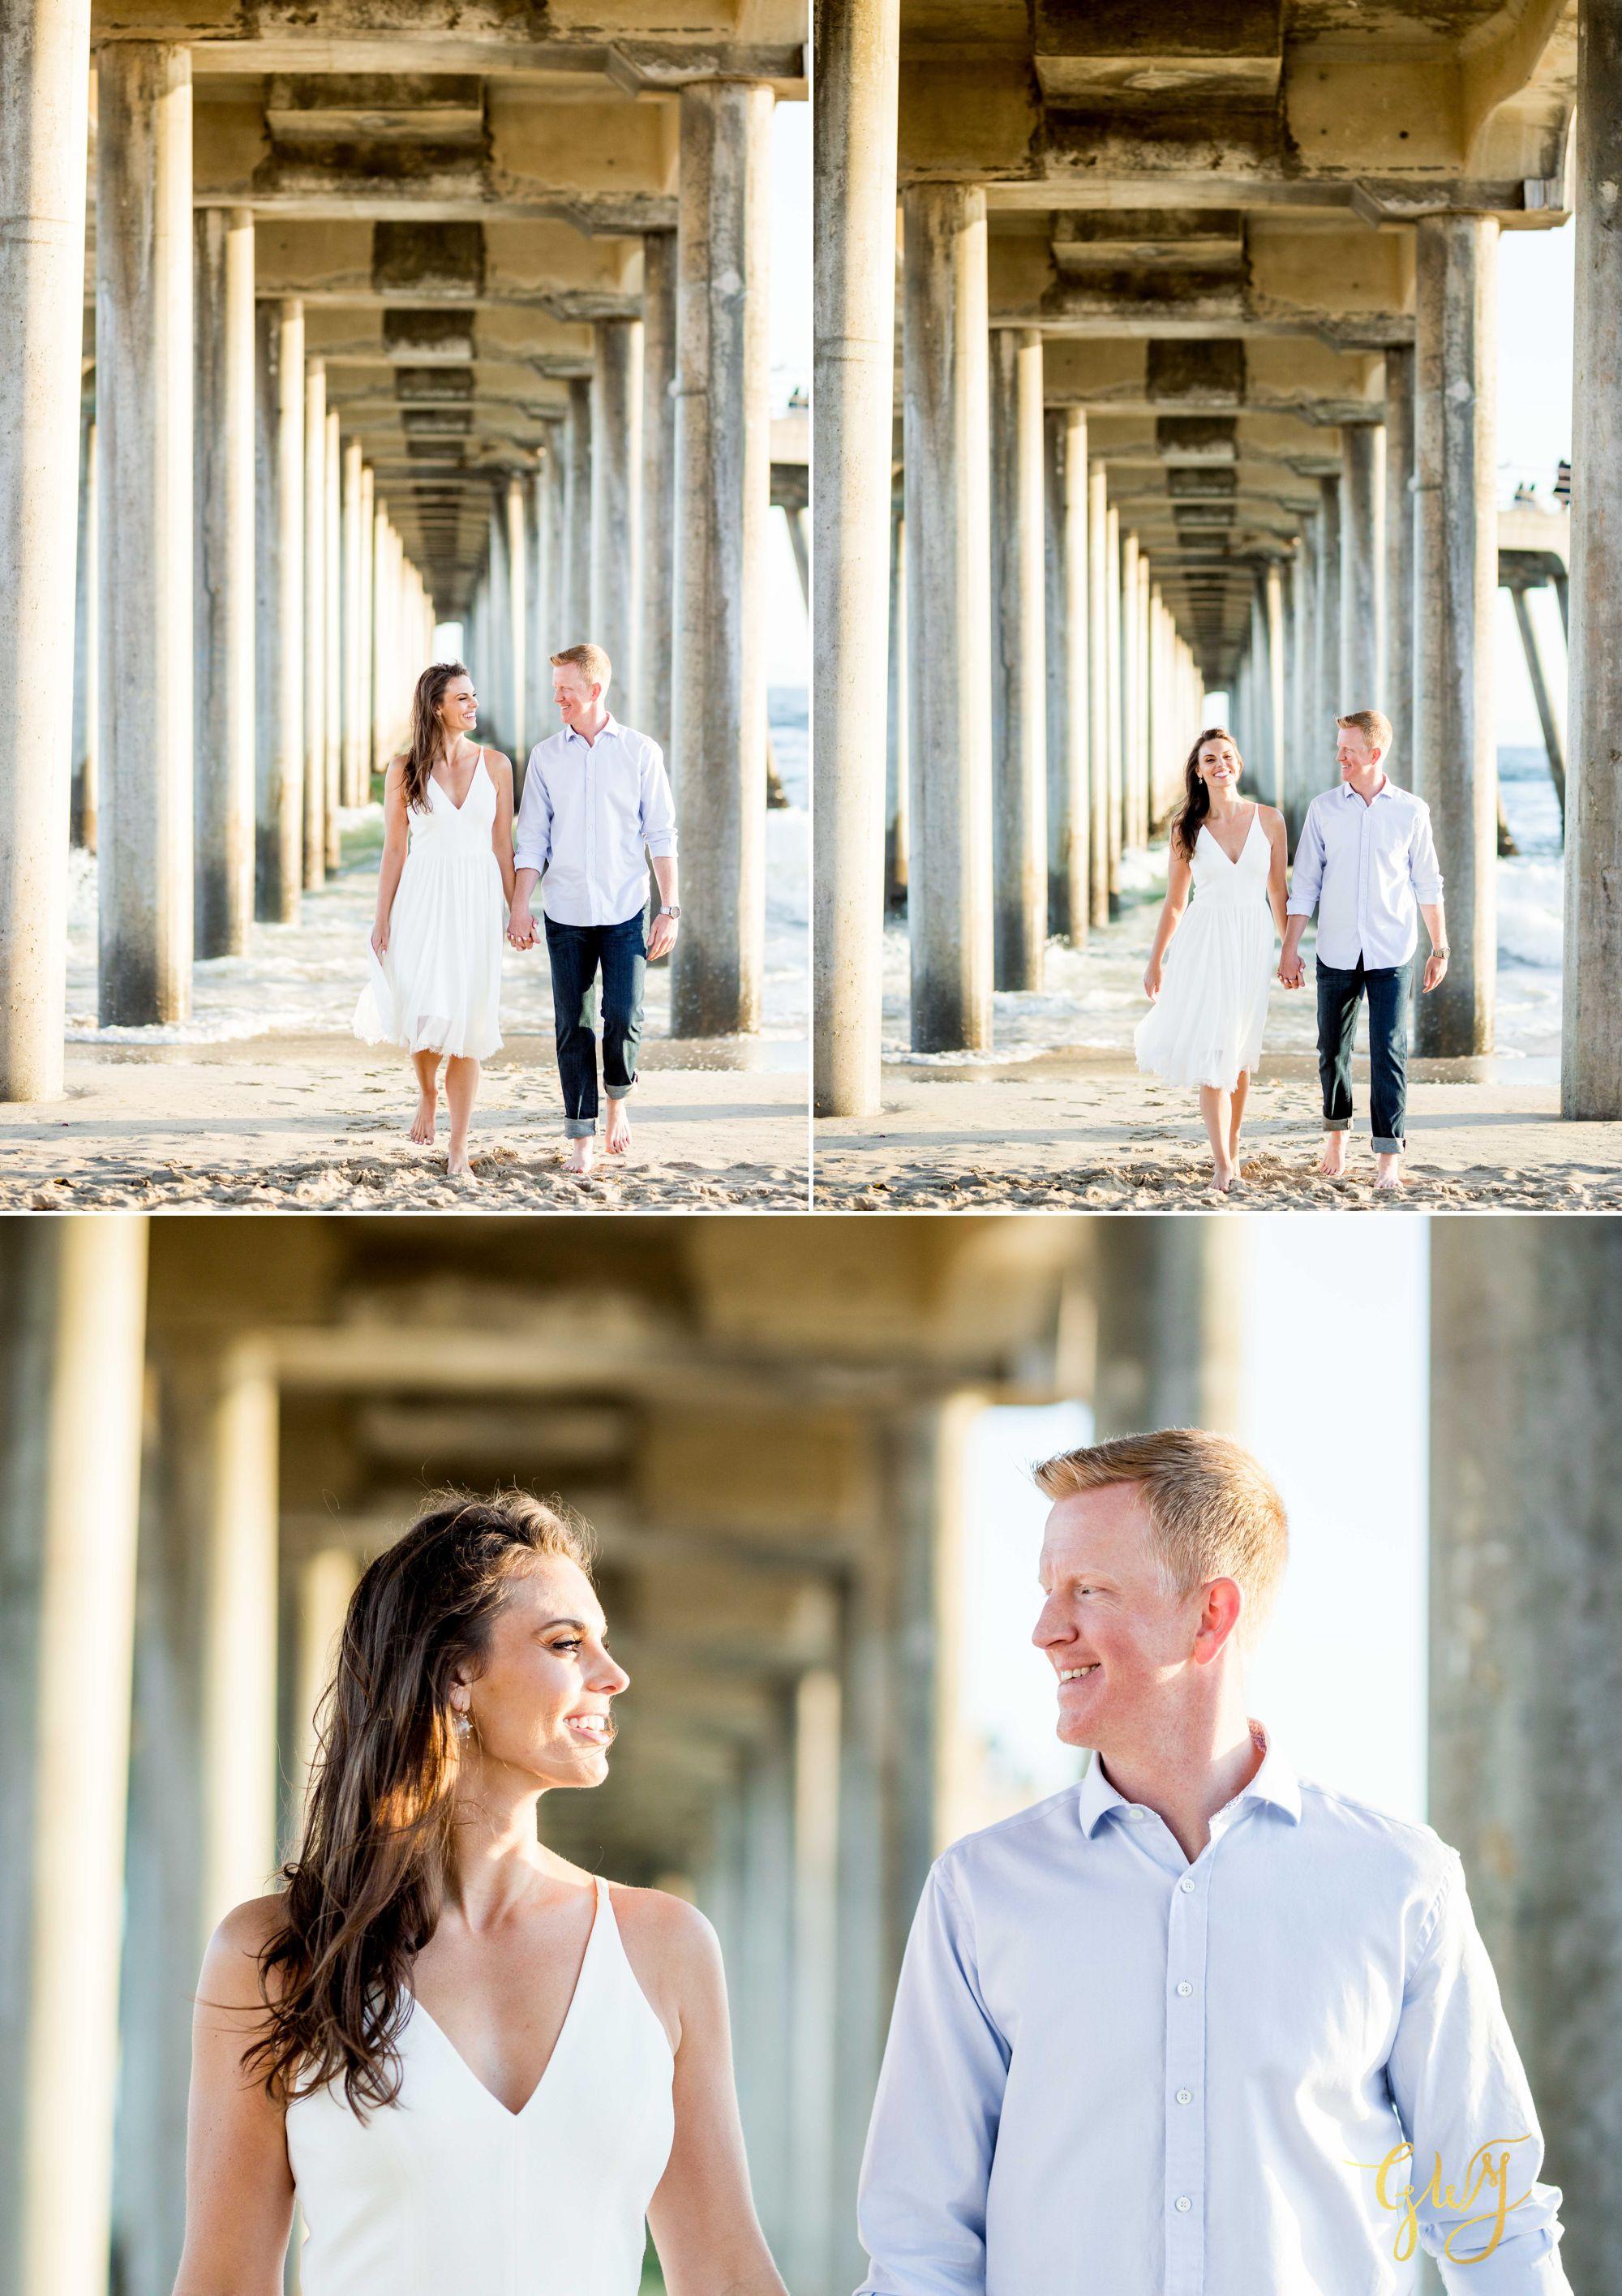 2019.05.27 - Ryley + Tolalf Romantic Summer Huntington Beach + HB Central Park Engagement Session by Glass Woods Media 9.jpg